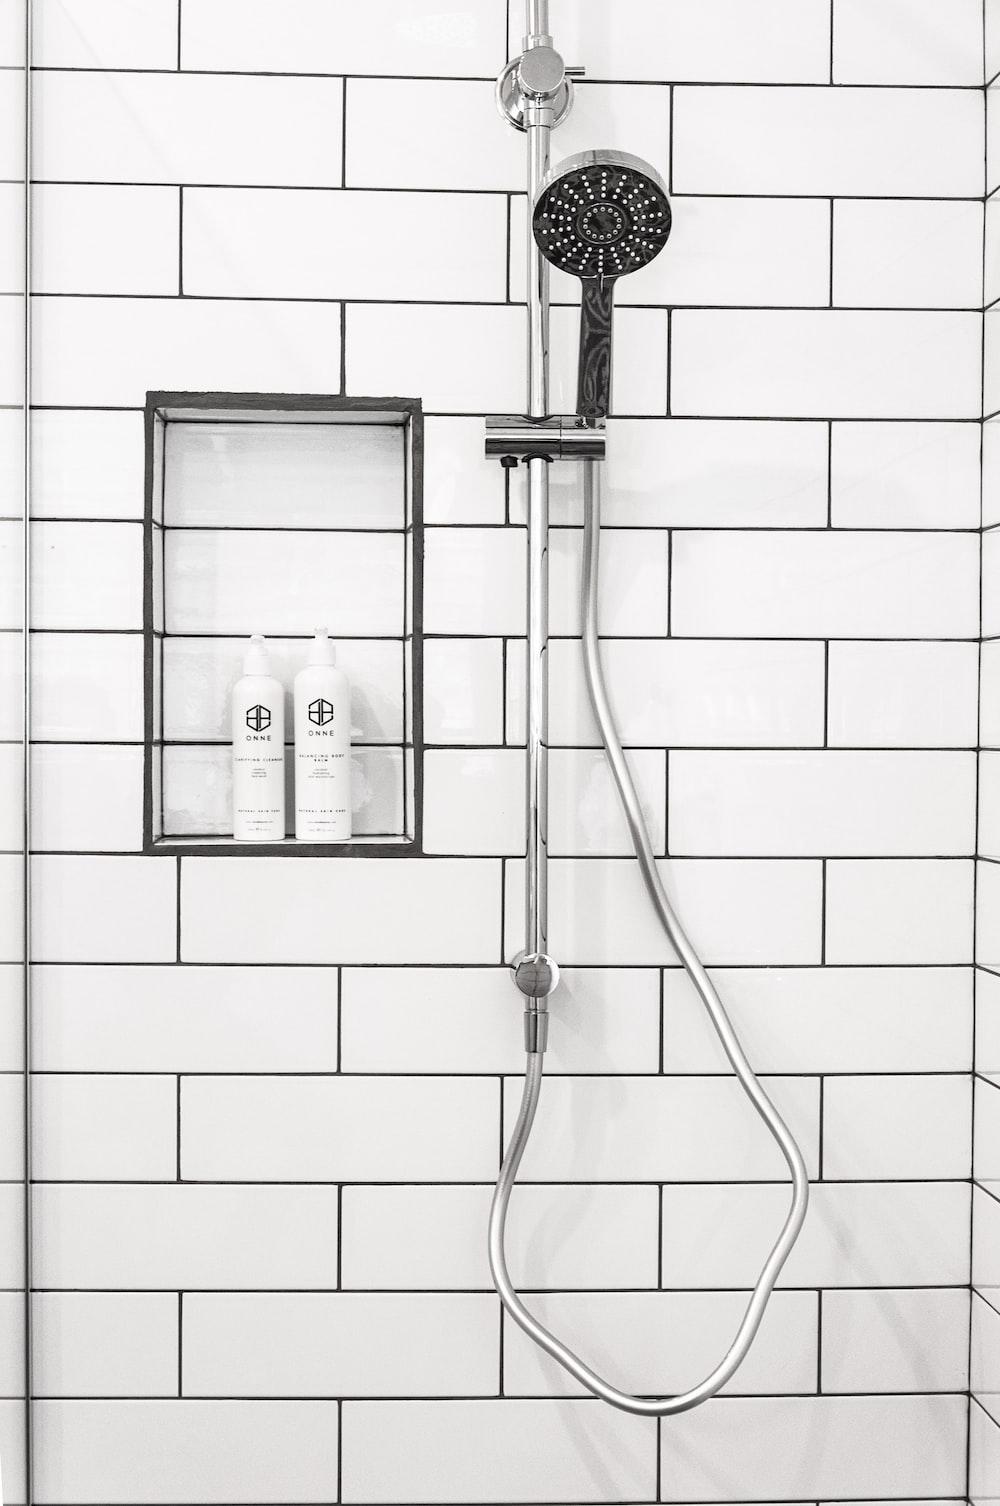 silver-colored shower head